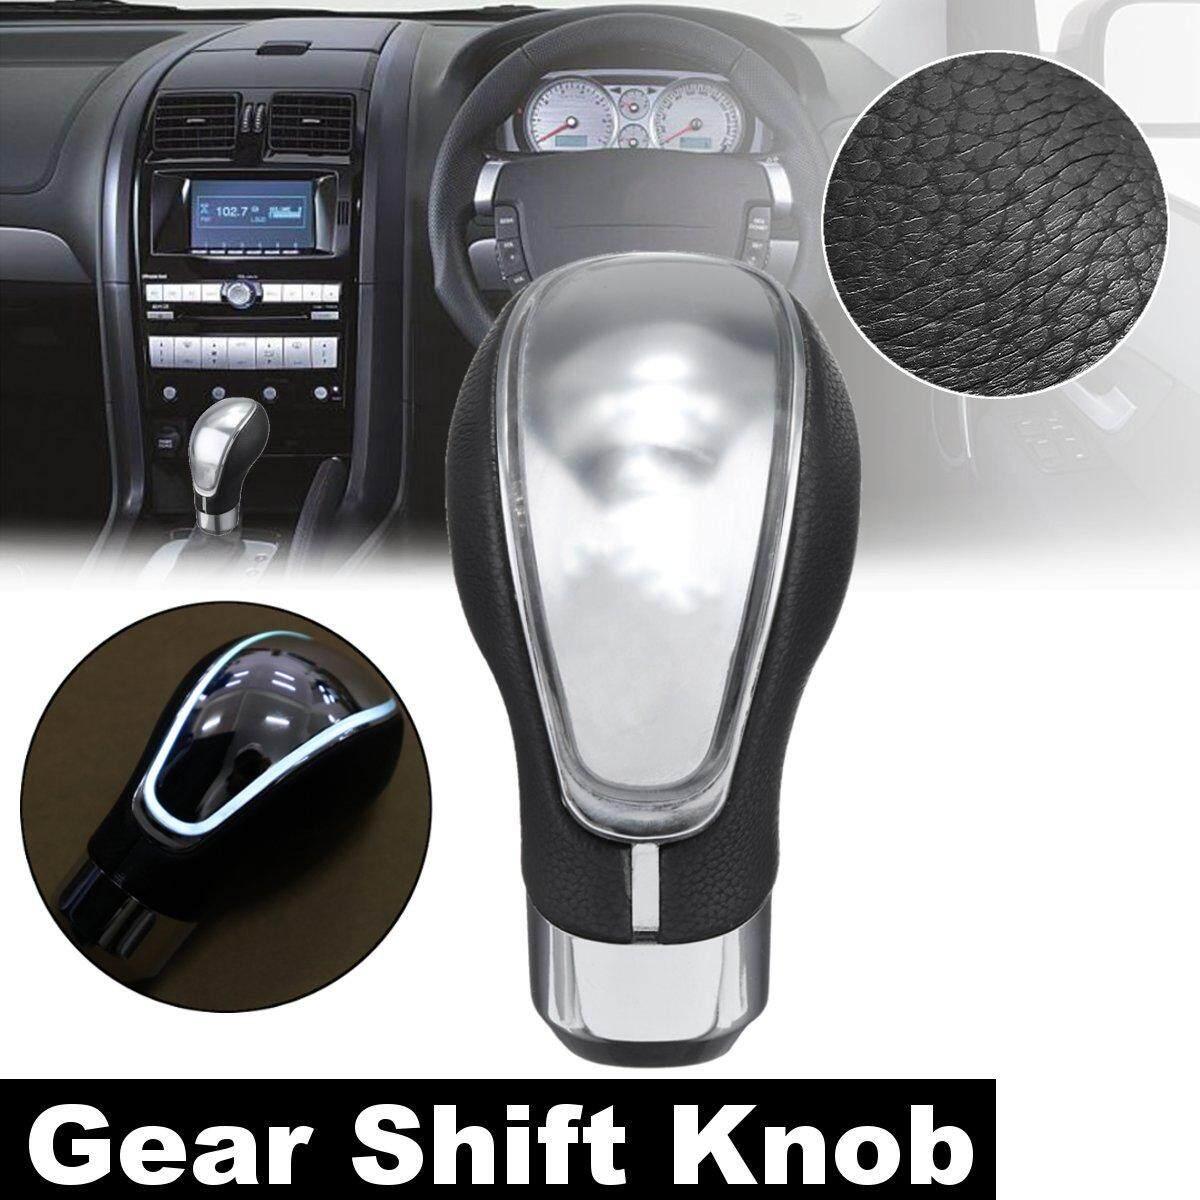 Shift Knob Led White lazada. Beli di lazada. Desciption product Universal Mobil Perlengkapan Shift